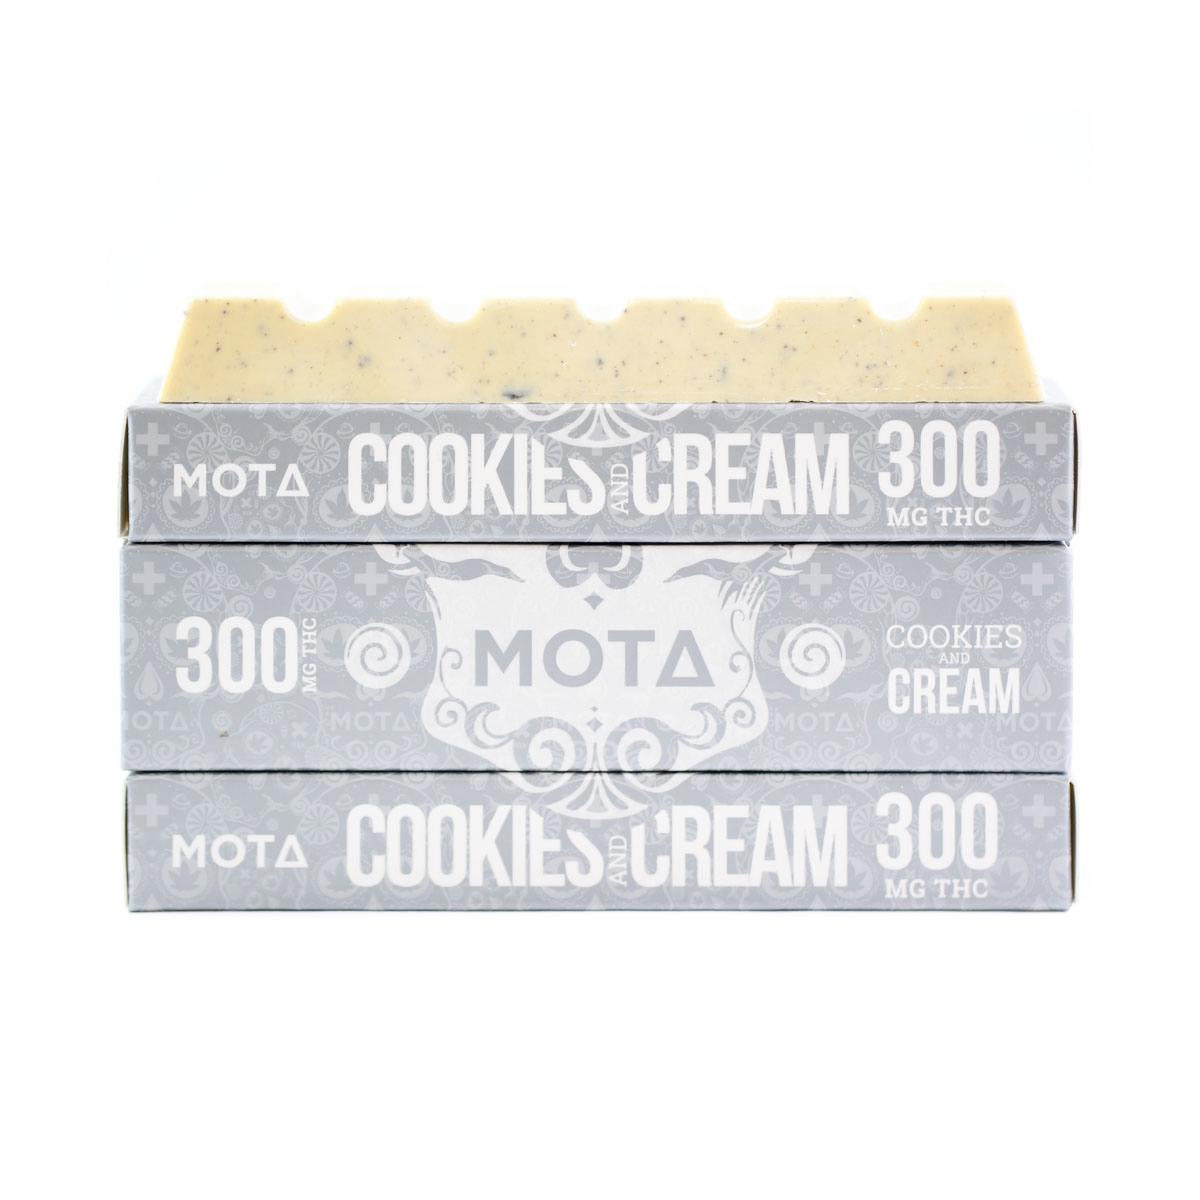 Buy MOTA - Cookies and Cream Chocolate Bar